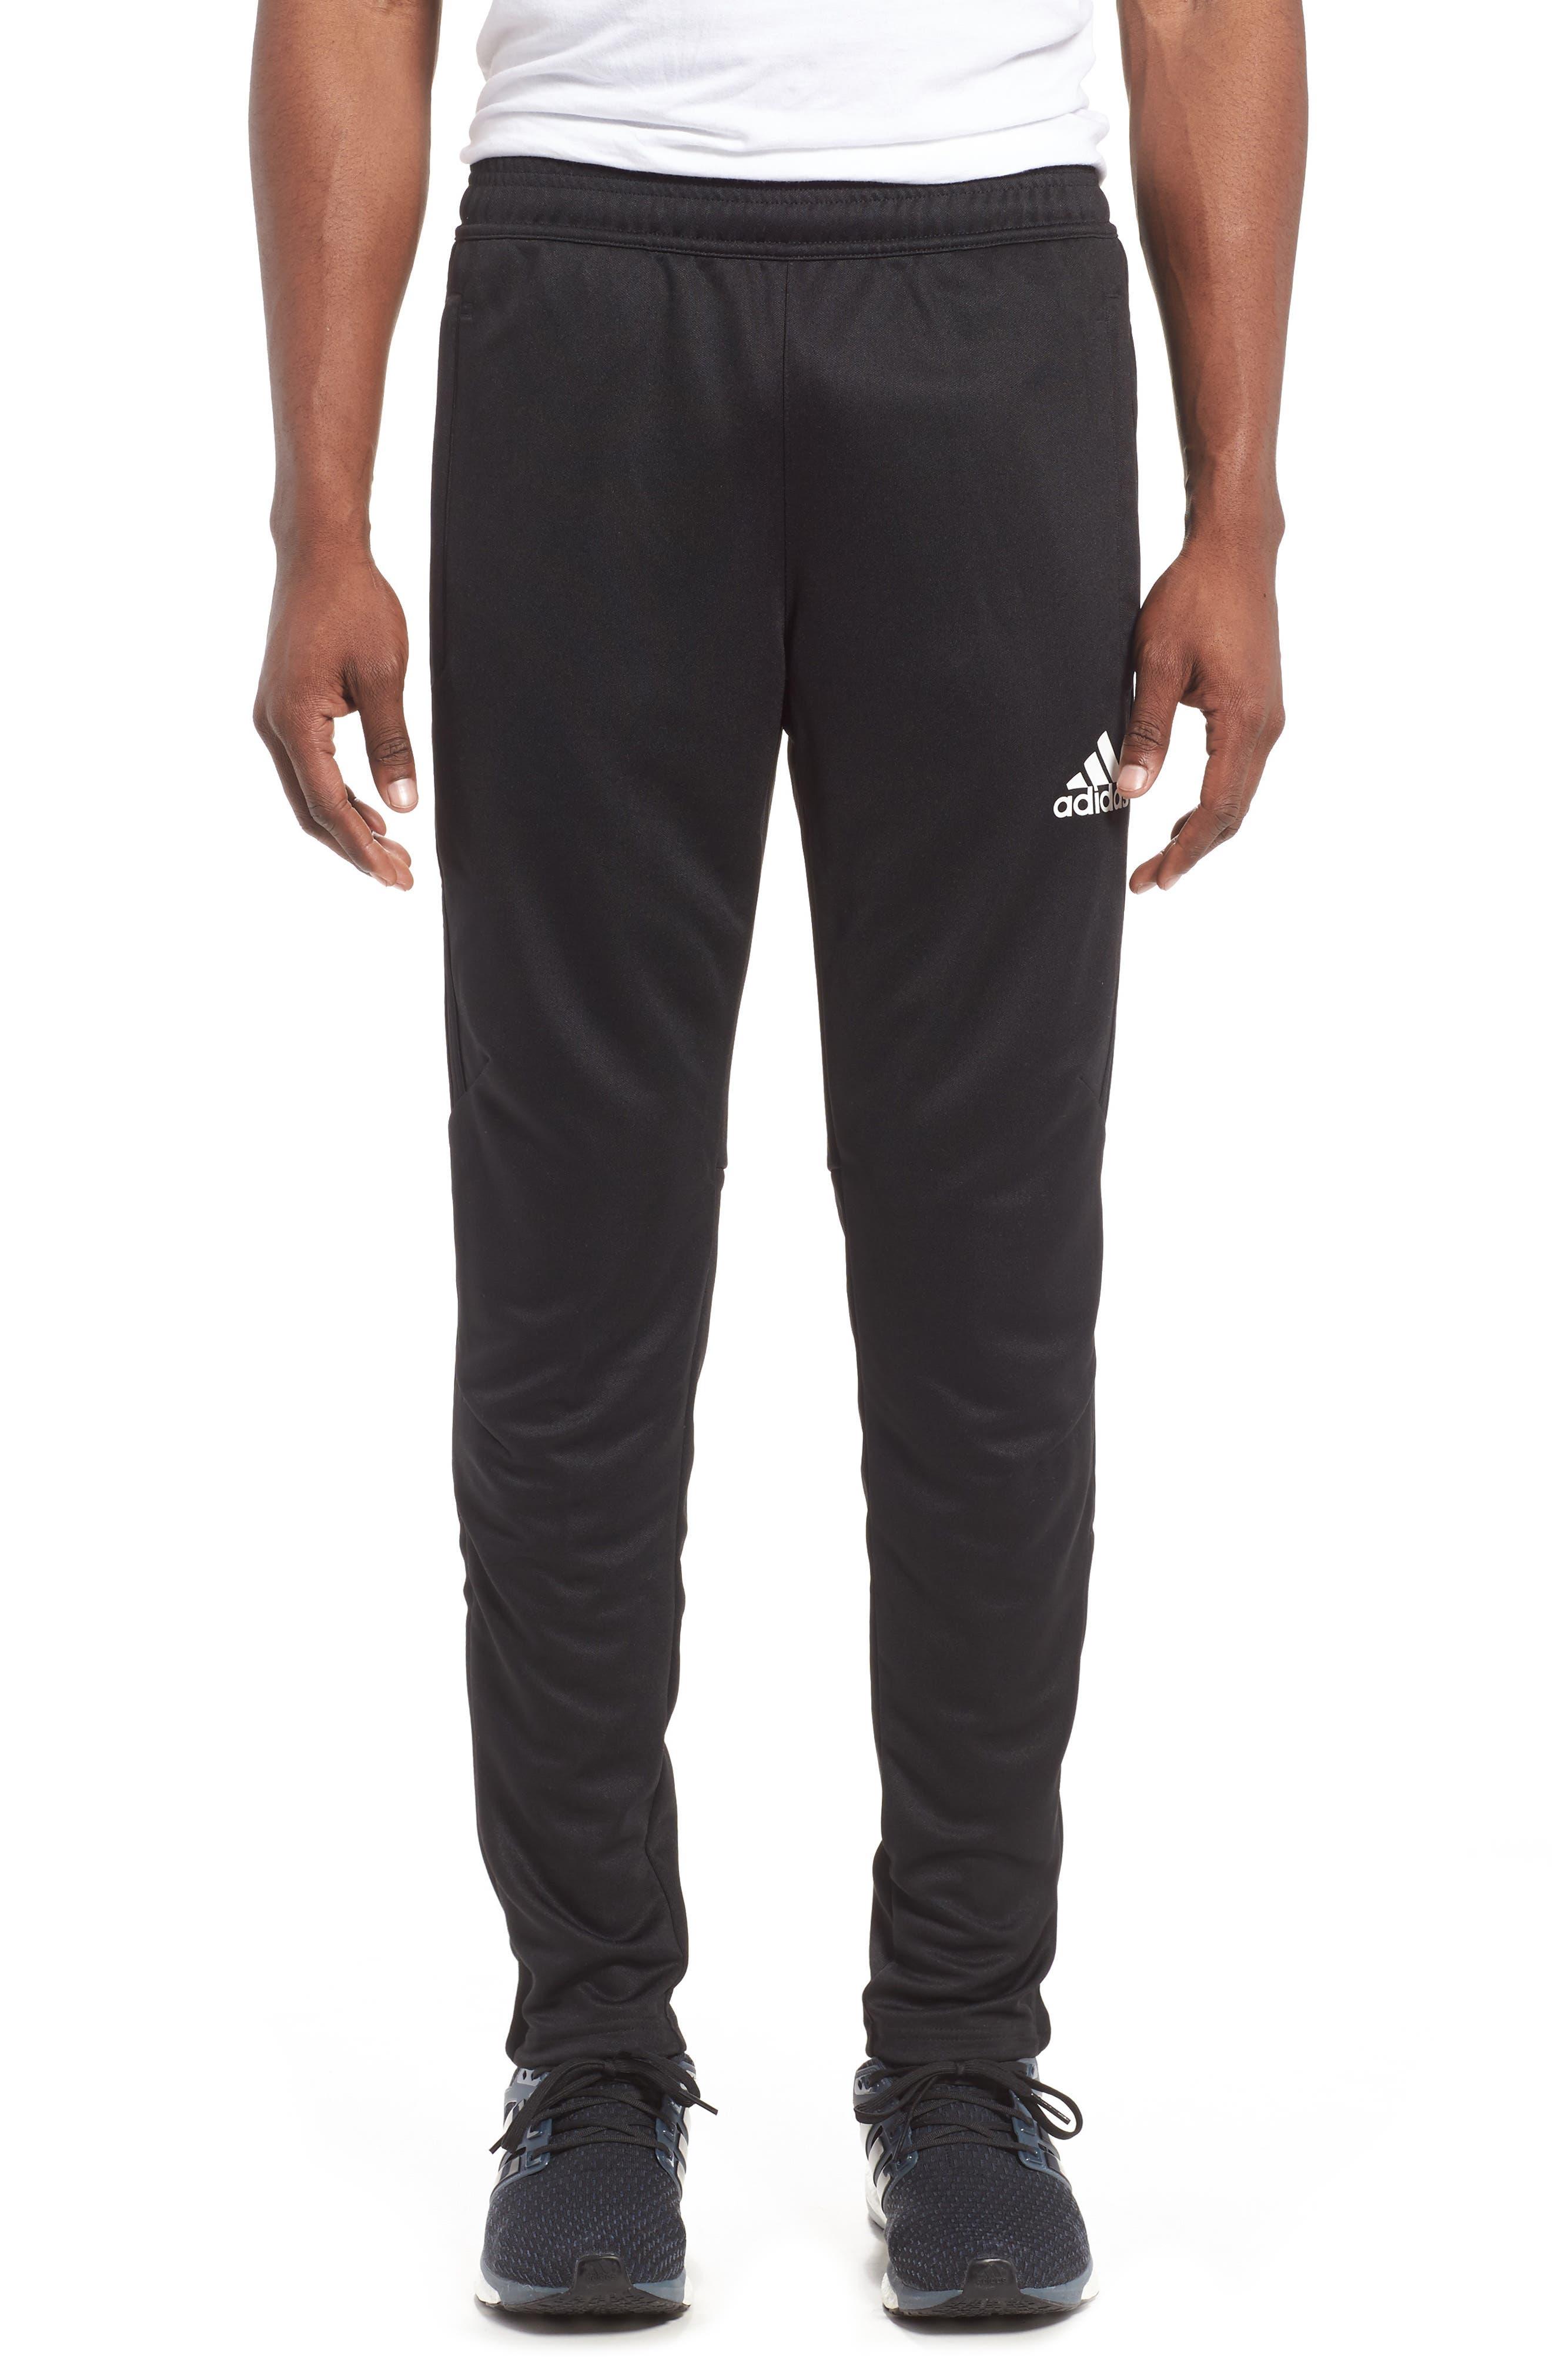 Main Image - adidas Tiro 17 Training Pants